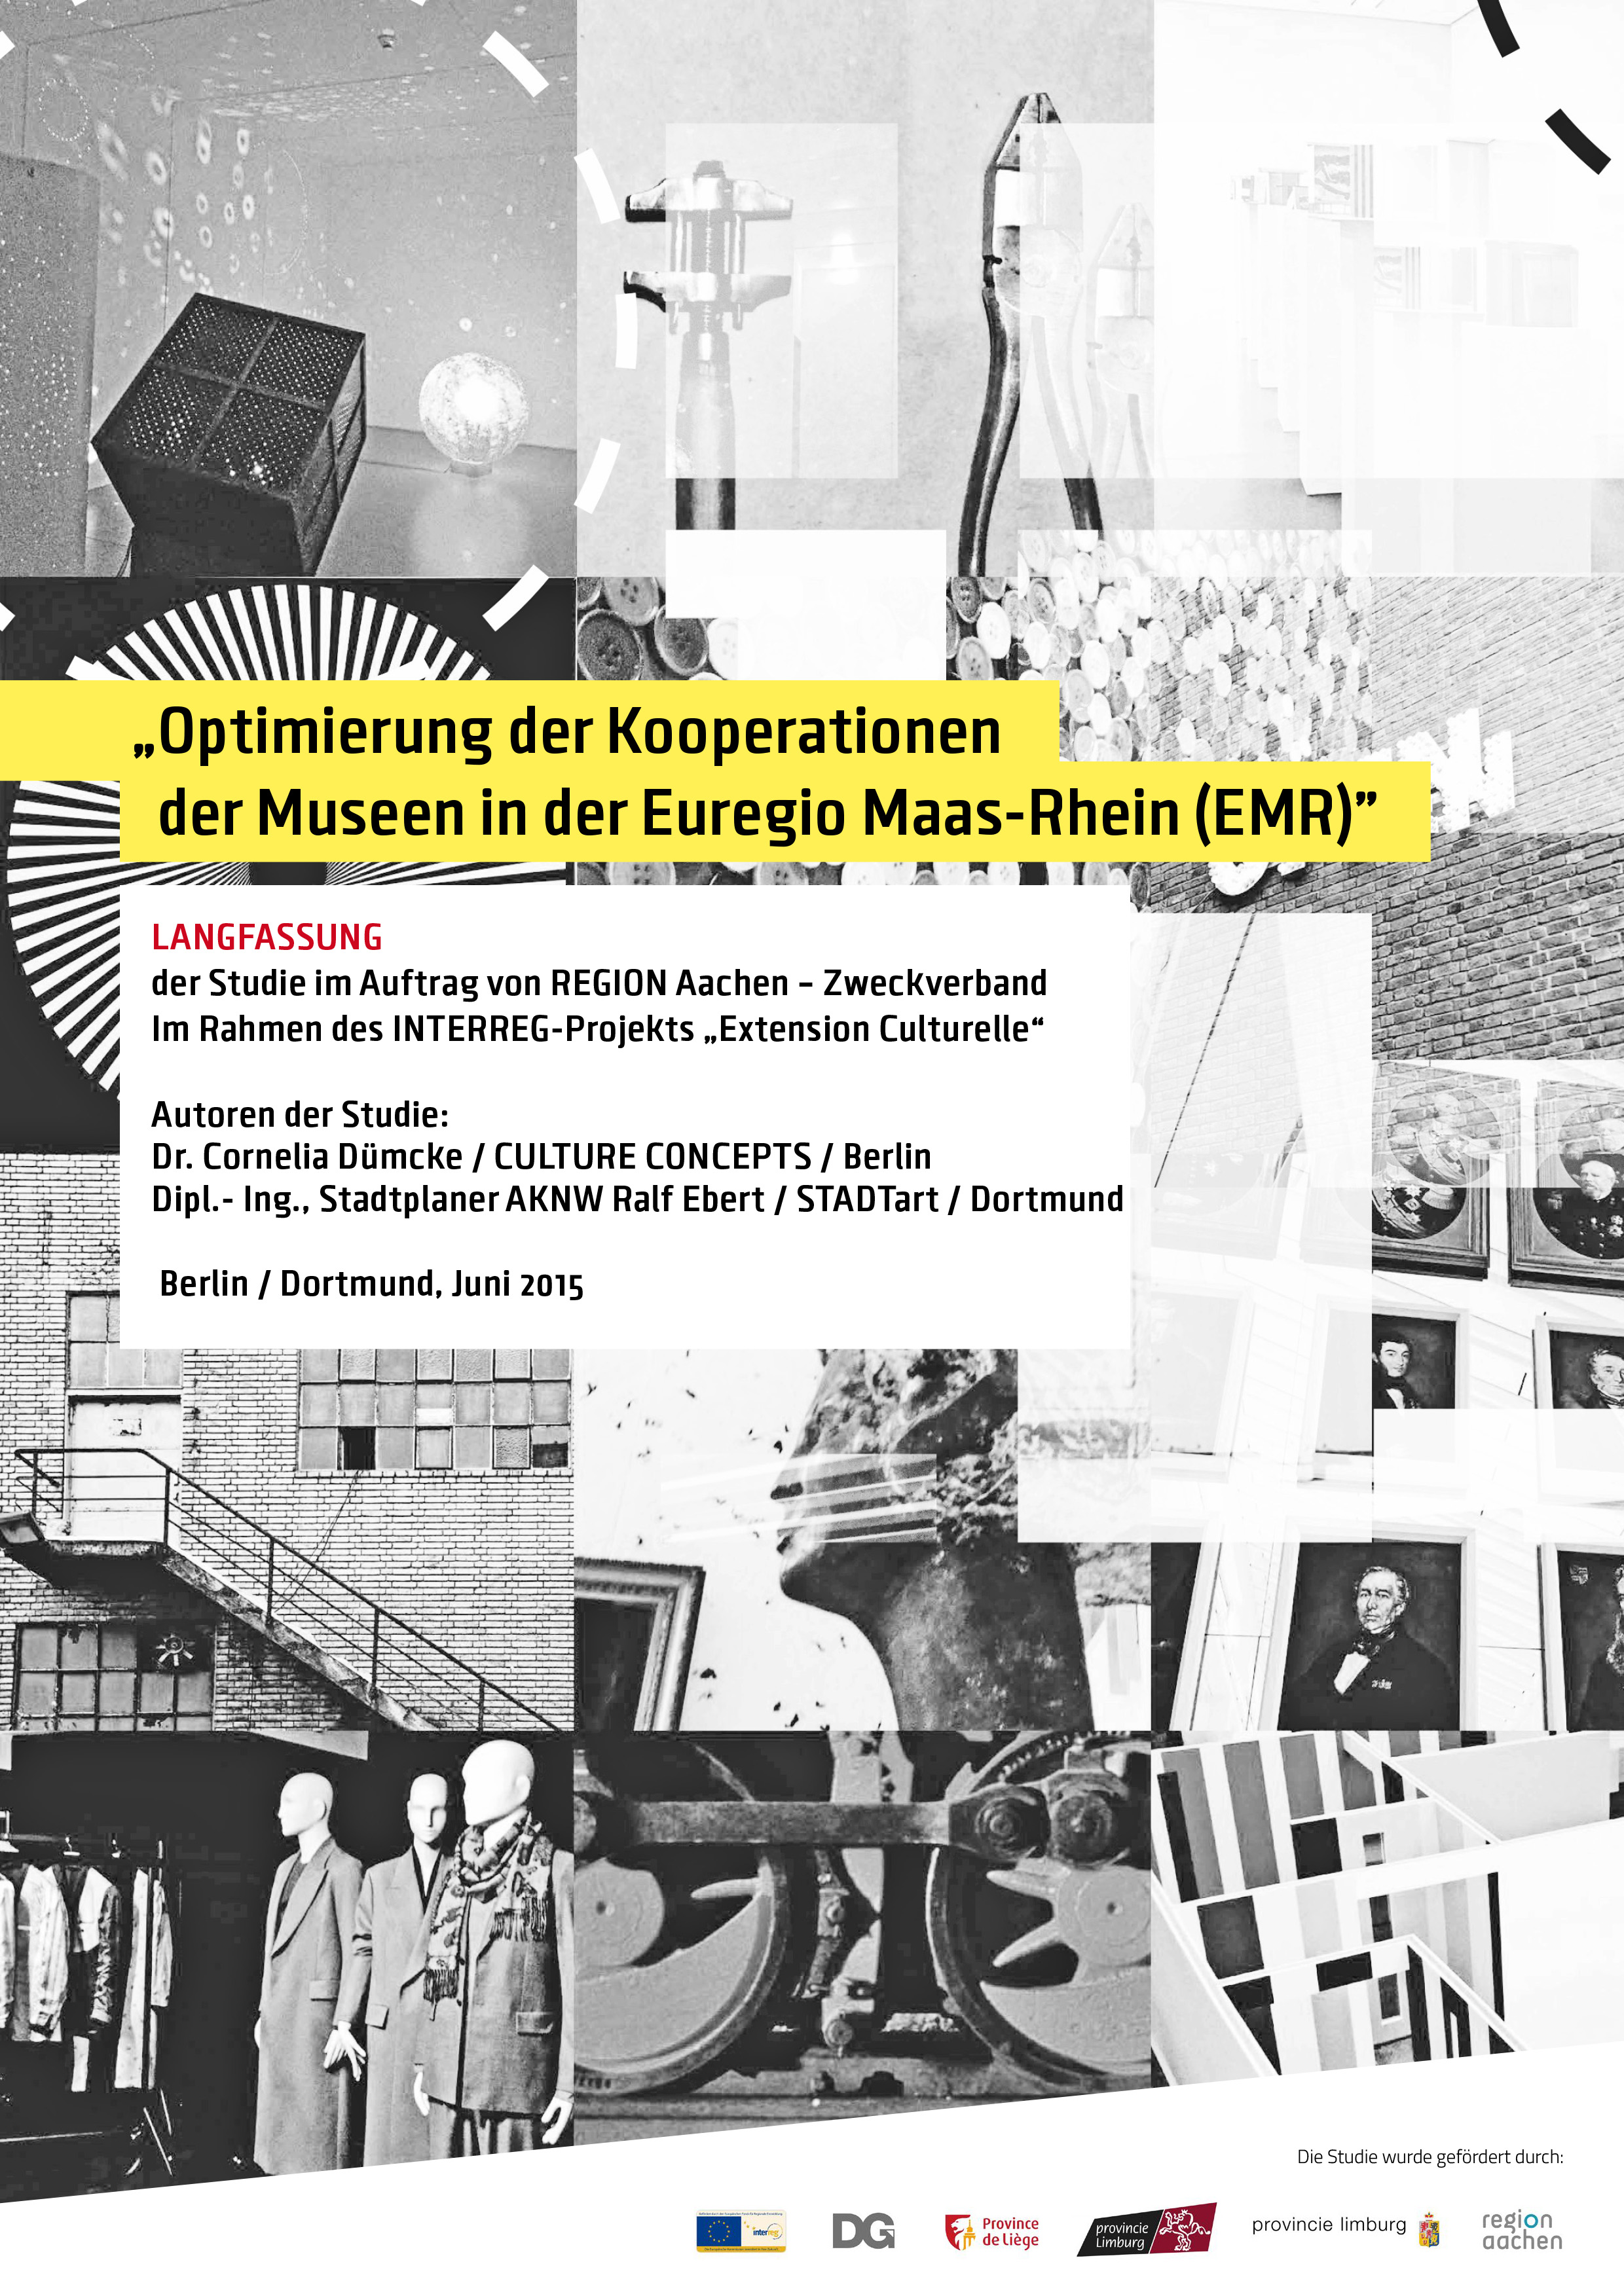 2015_DB_Dümcke_Ebert_Museen Kooperation in EMR.jpg